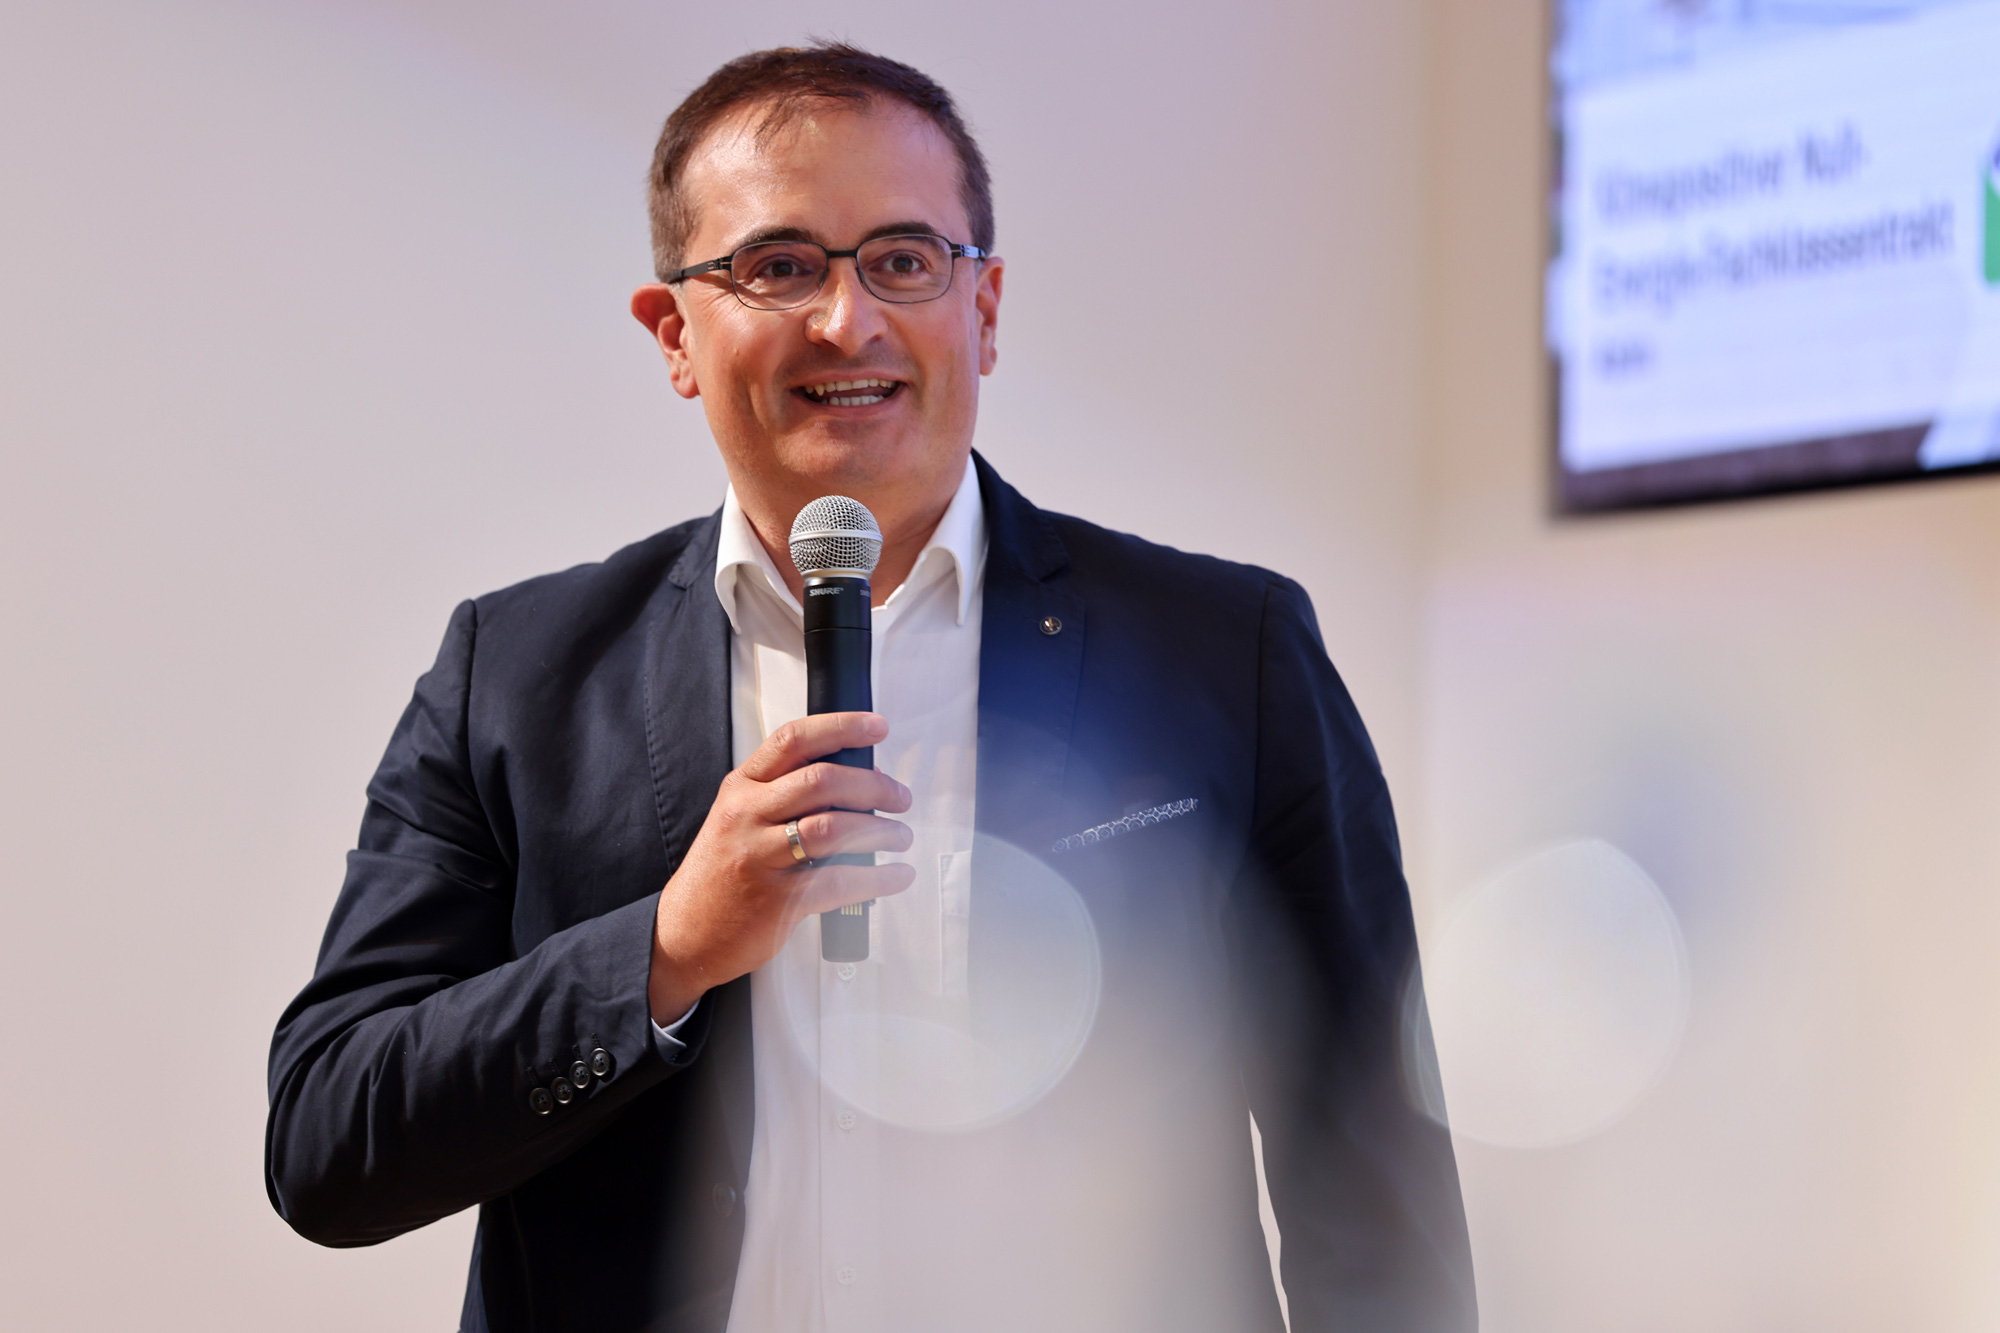 Green Solutions Awards 2020/2021 Preisverleihung